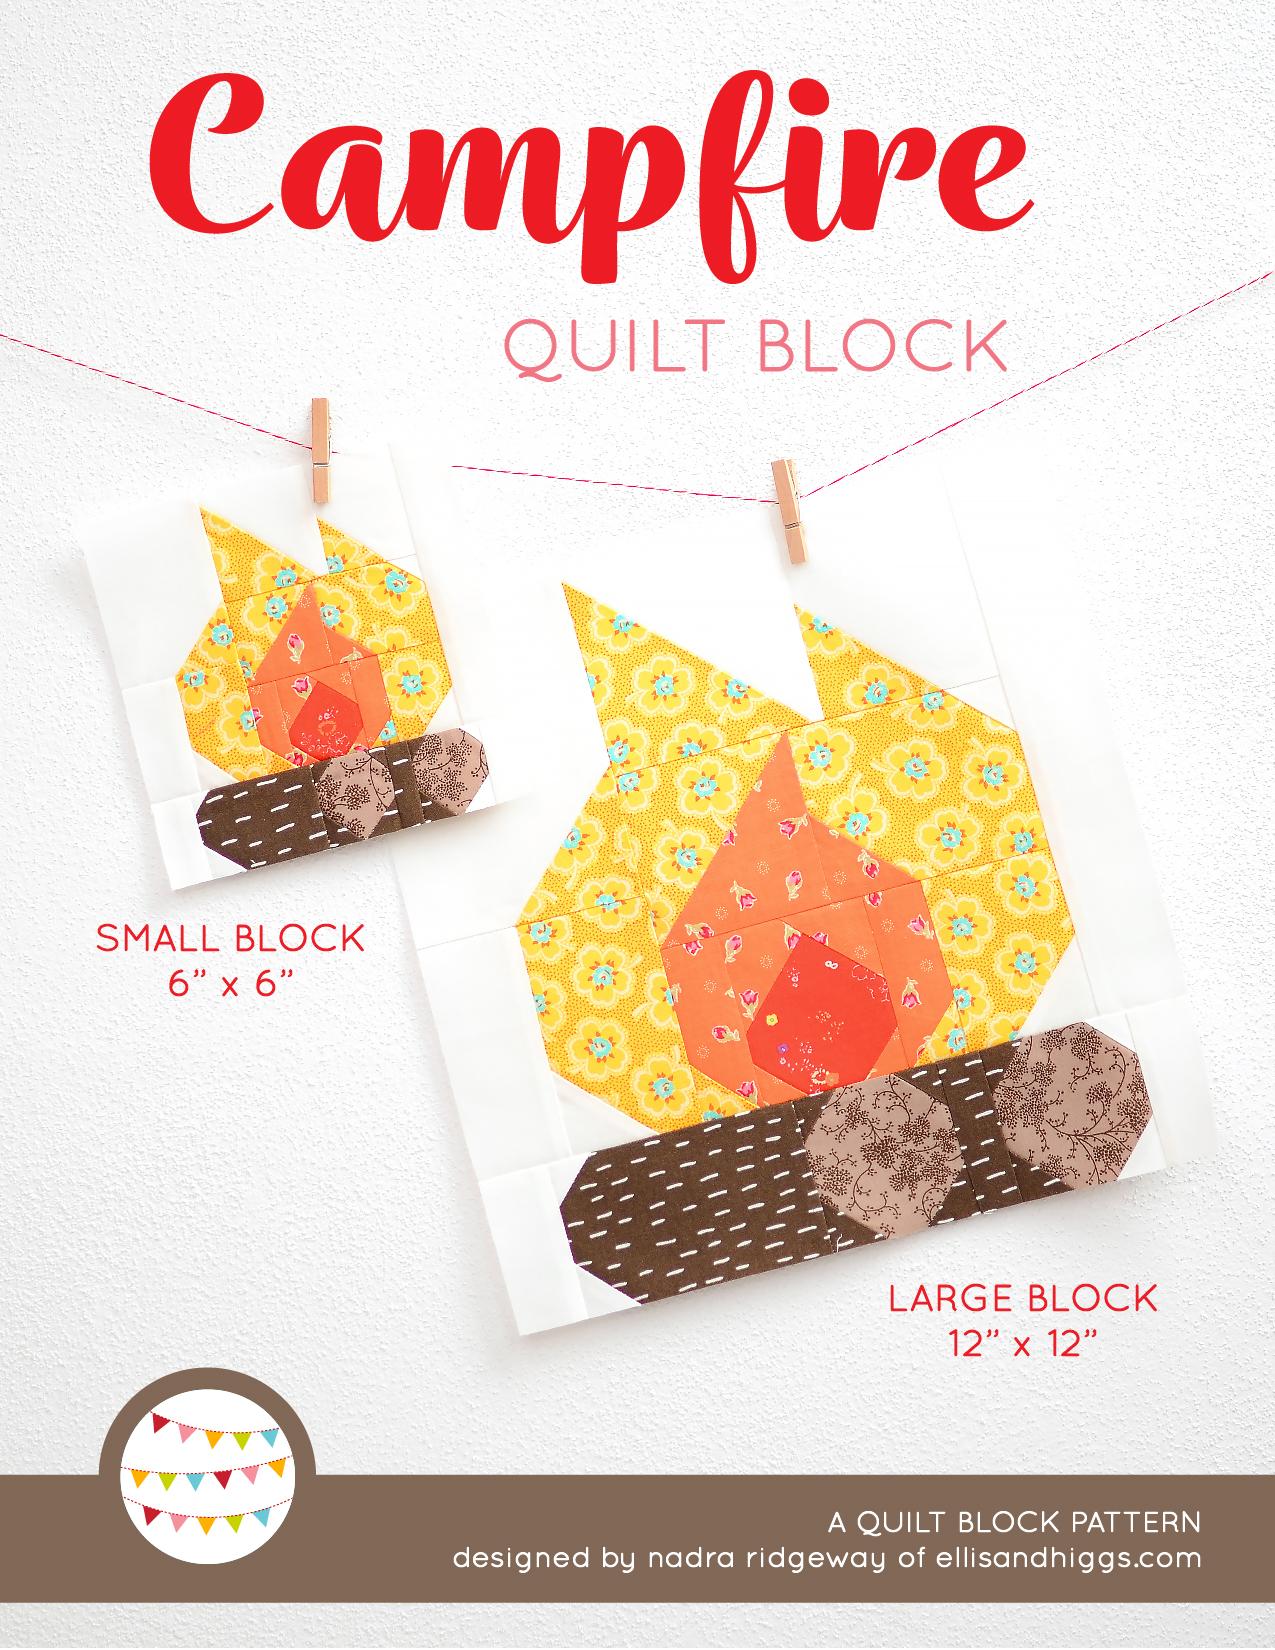 Summer quilt patterns - Campfire quilt pattern